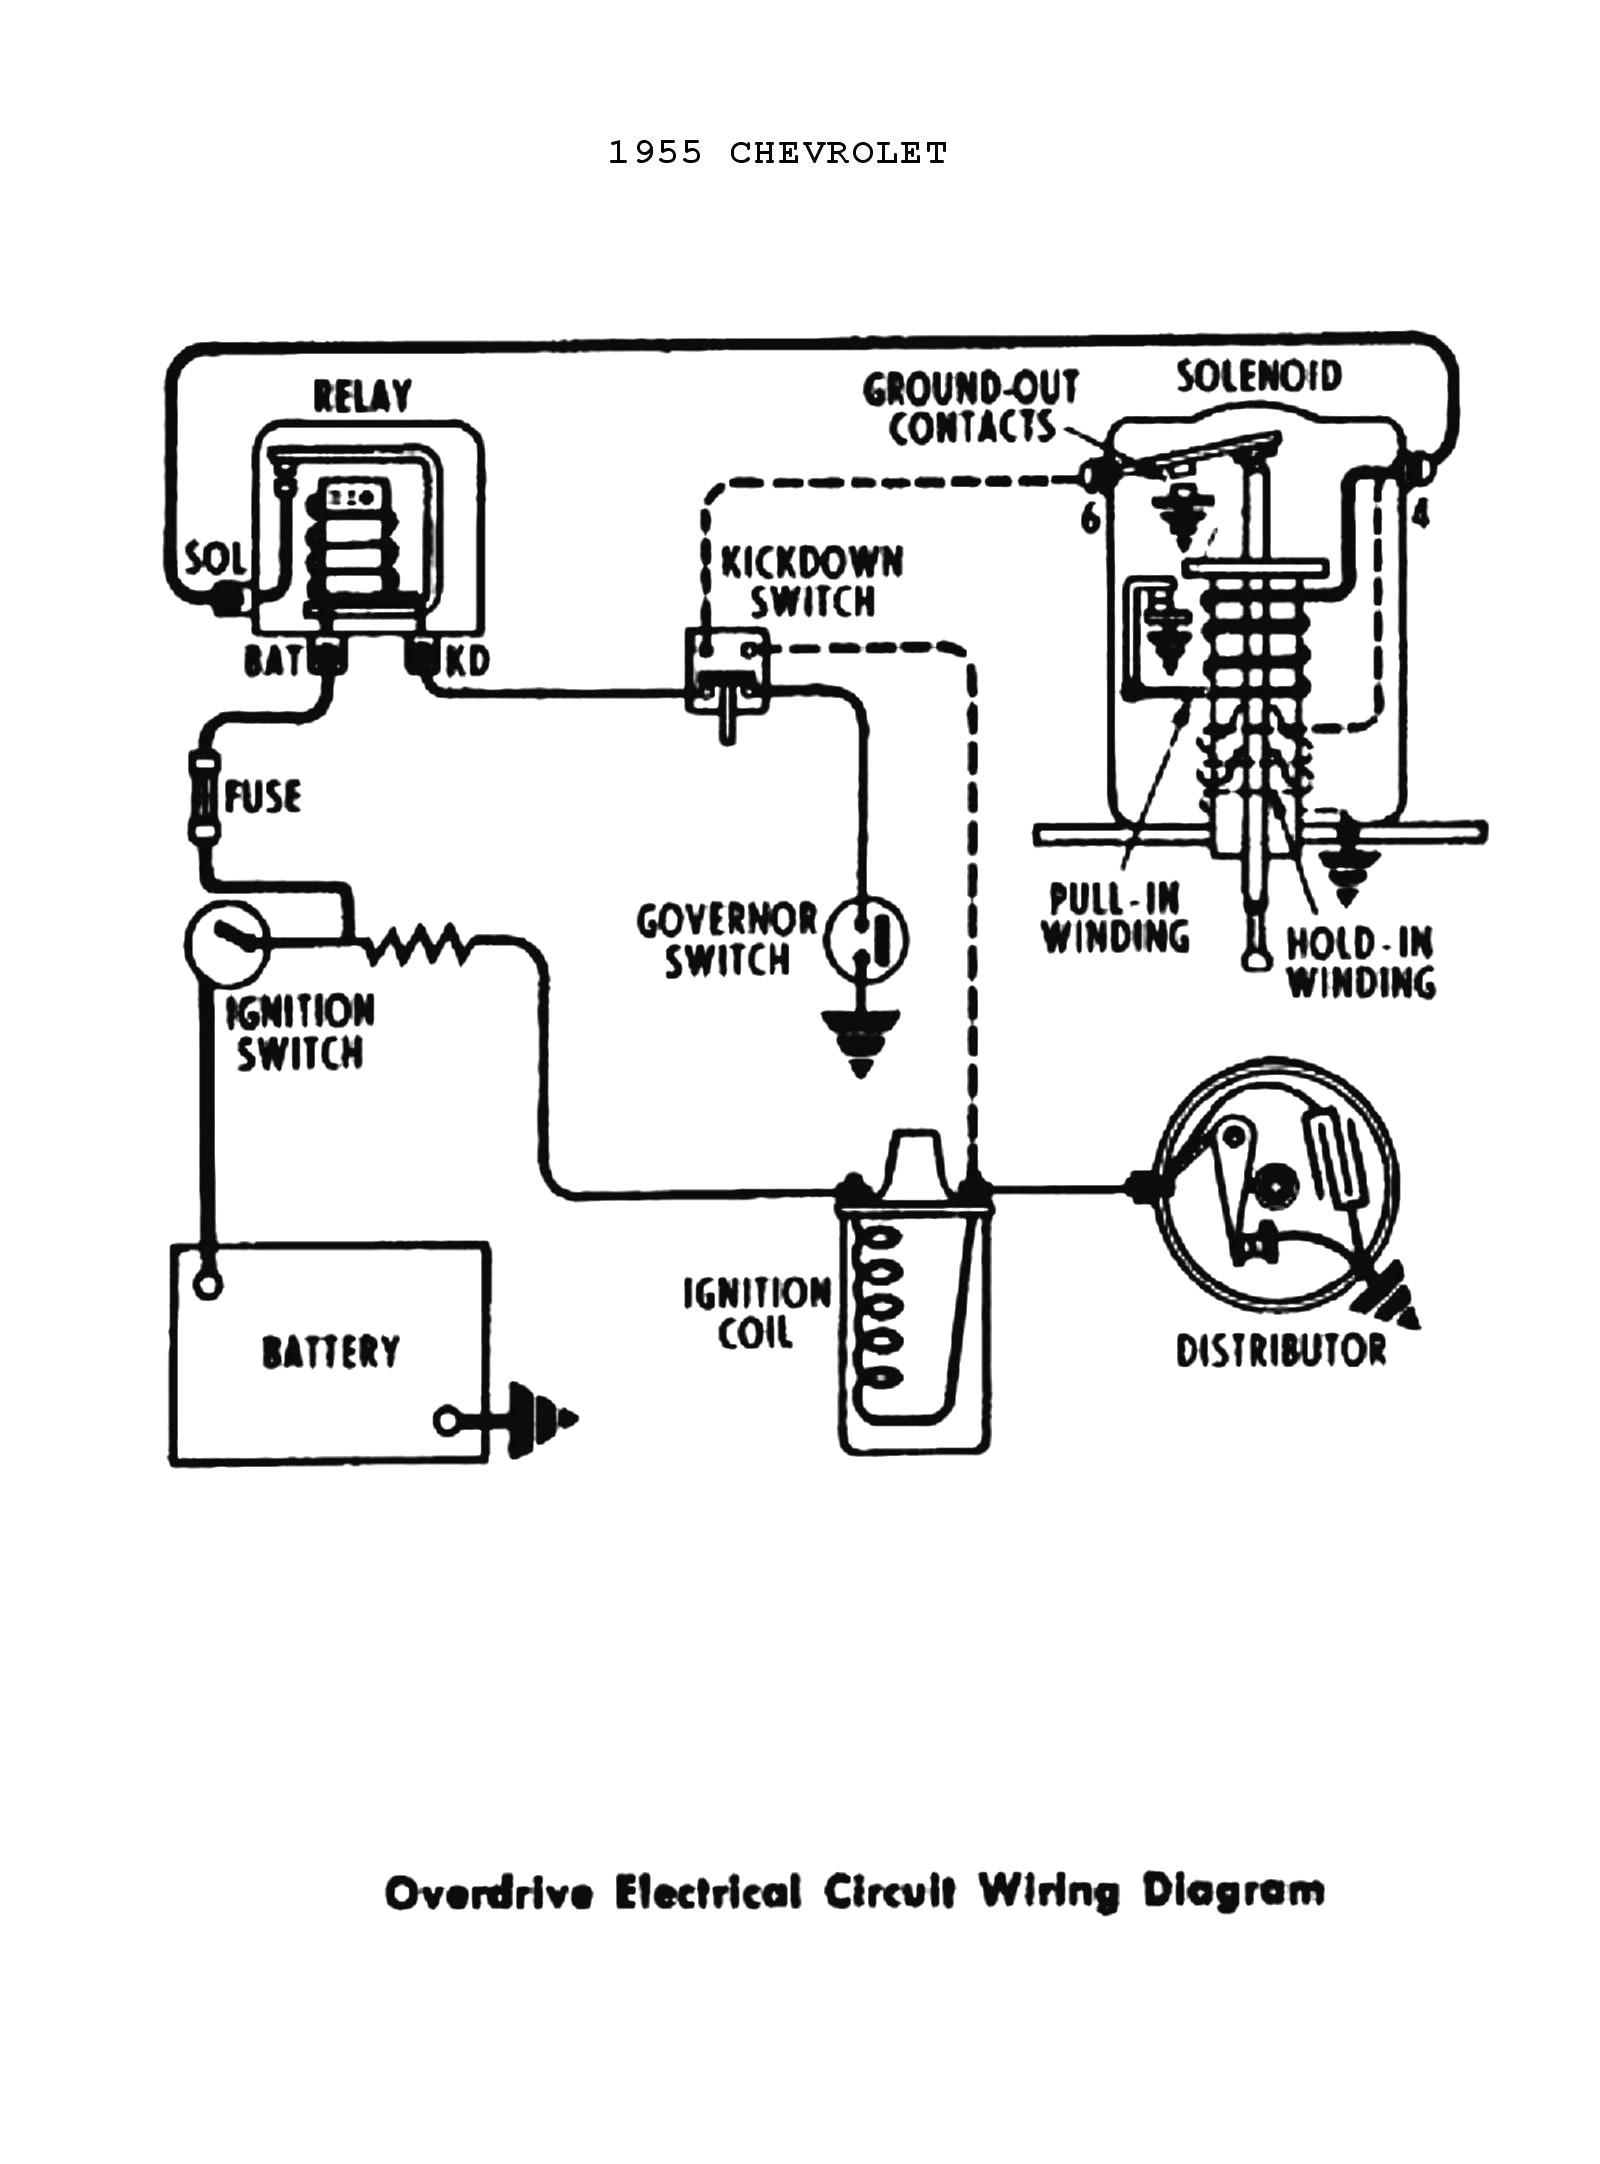 harness diagram for 1931 chevrolet wire center u2022 rh 207 246 123 107 93 Chevy Truck Wiring Diagram Chevy 1500 Wiring Diagram